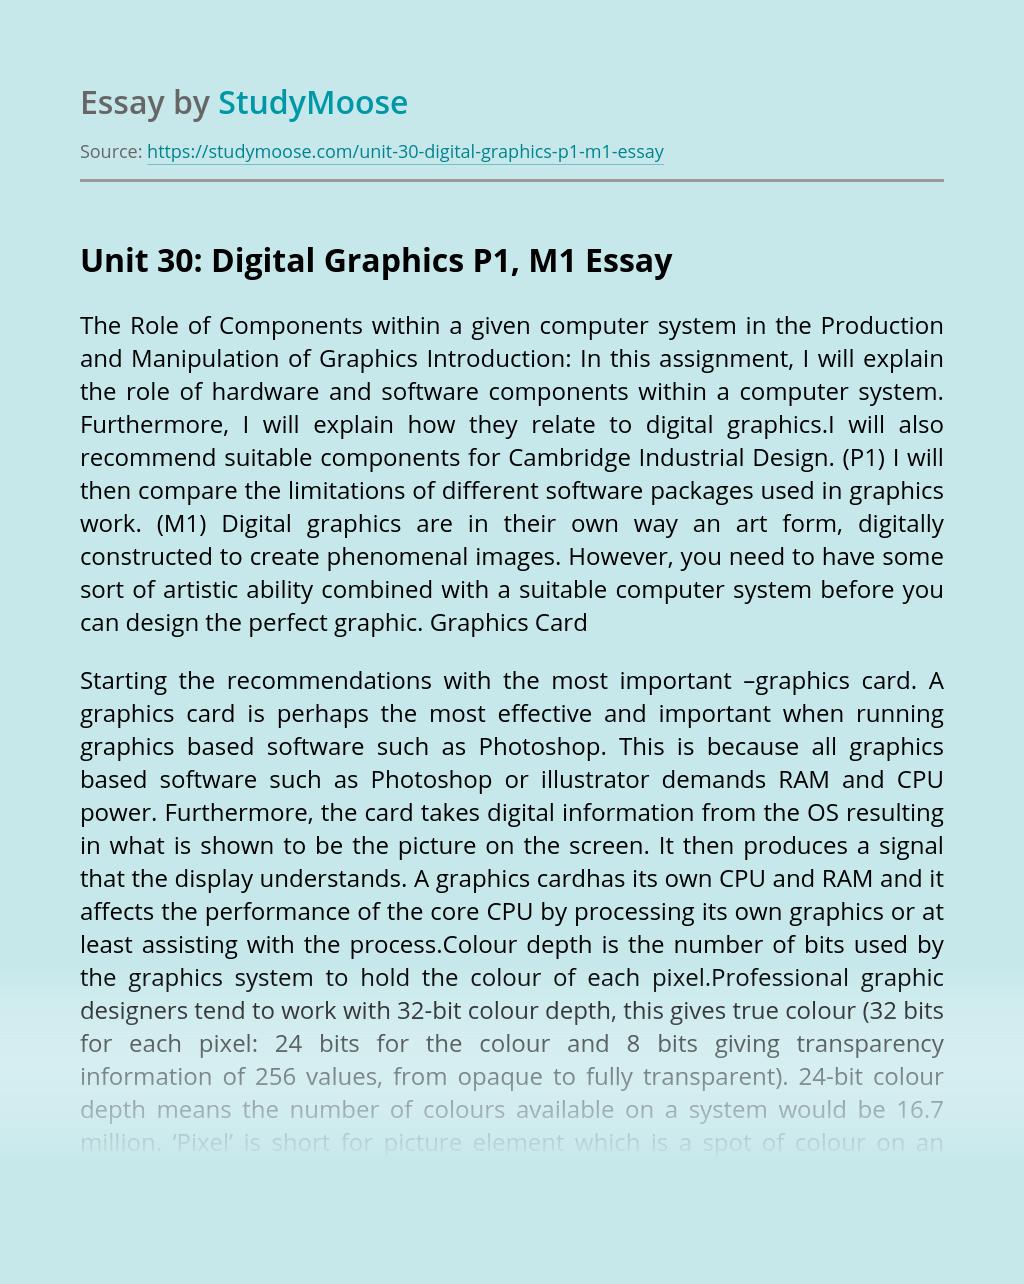 Unit 30: Digital Graphics P1, M1